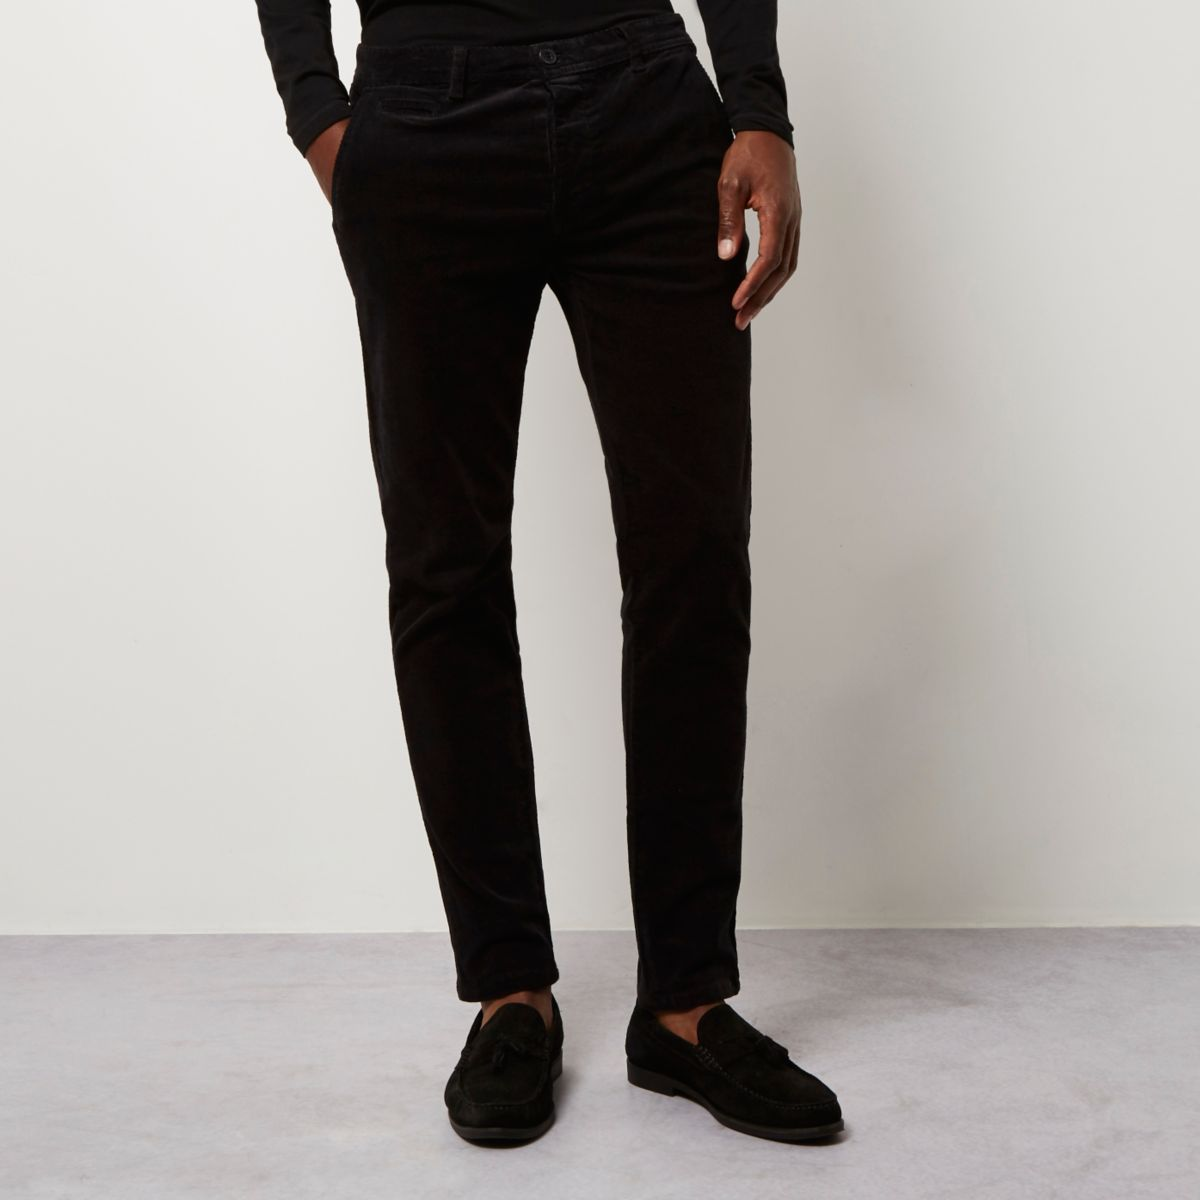 Black skinny corduroy chino trousers